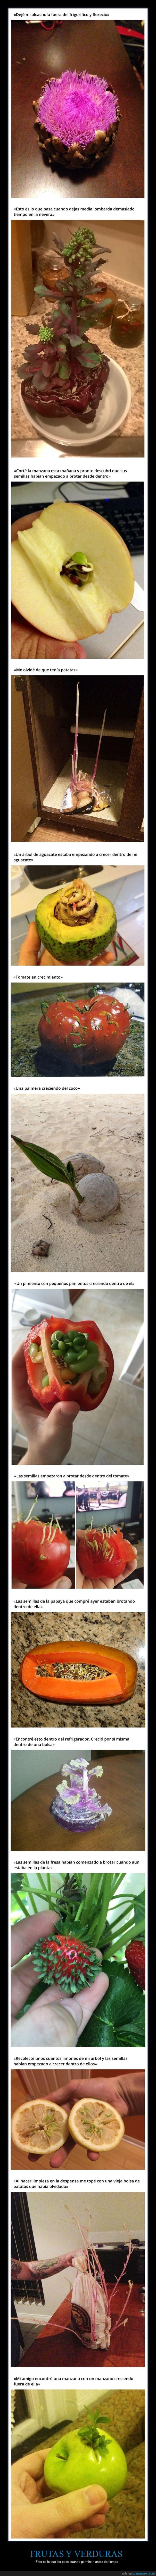 frutas,germinar,verduras